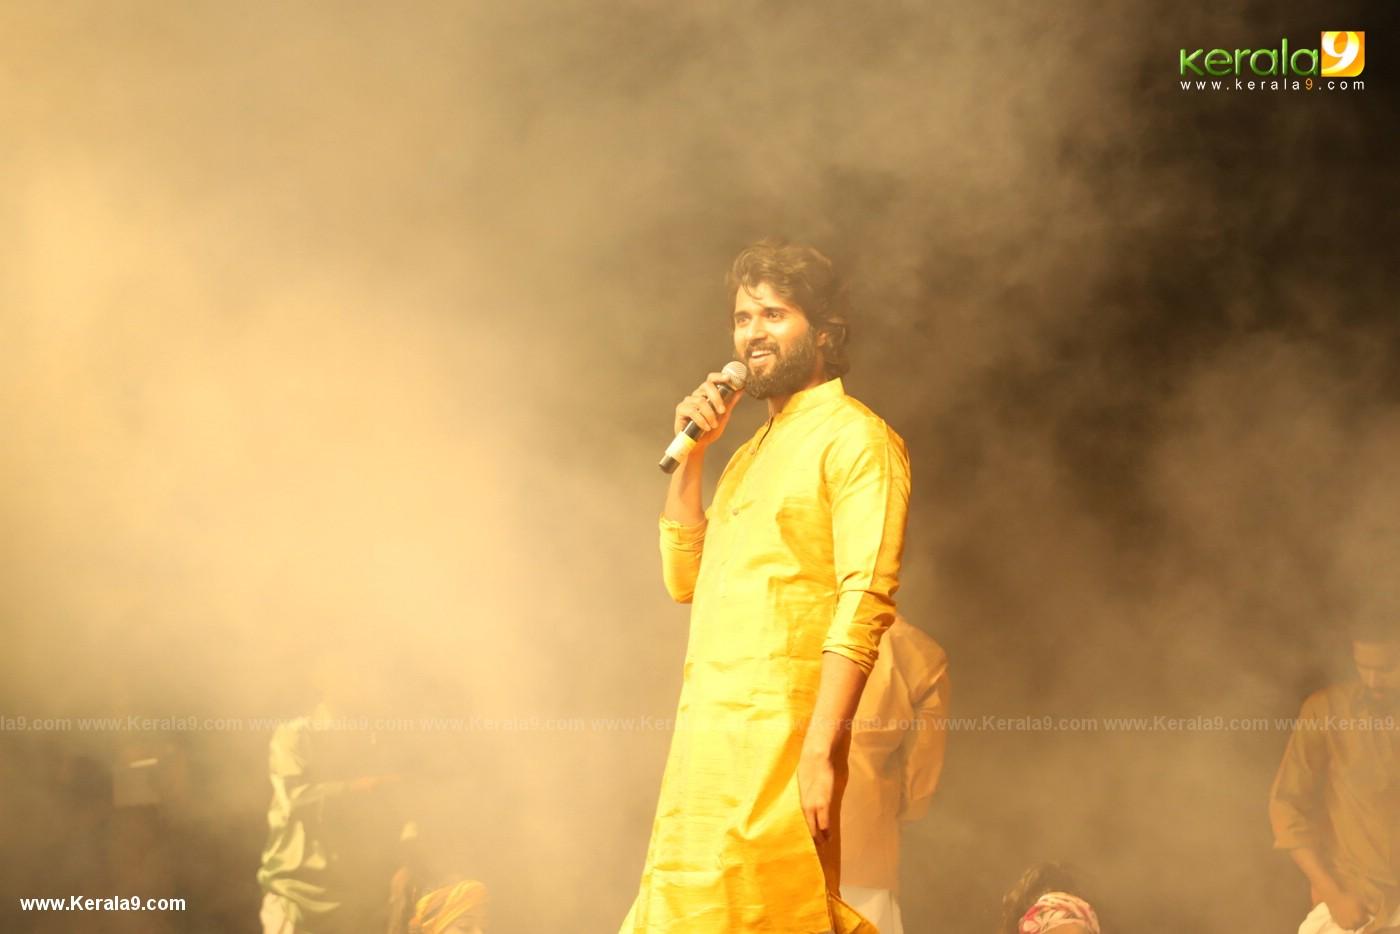 Dear Comrade movie premotion kerala kochi photos 111 - Kerala9.com